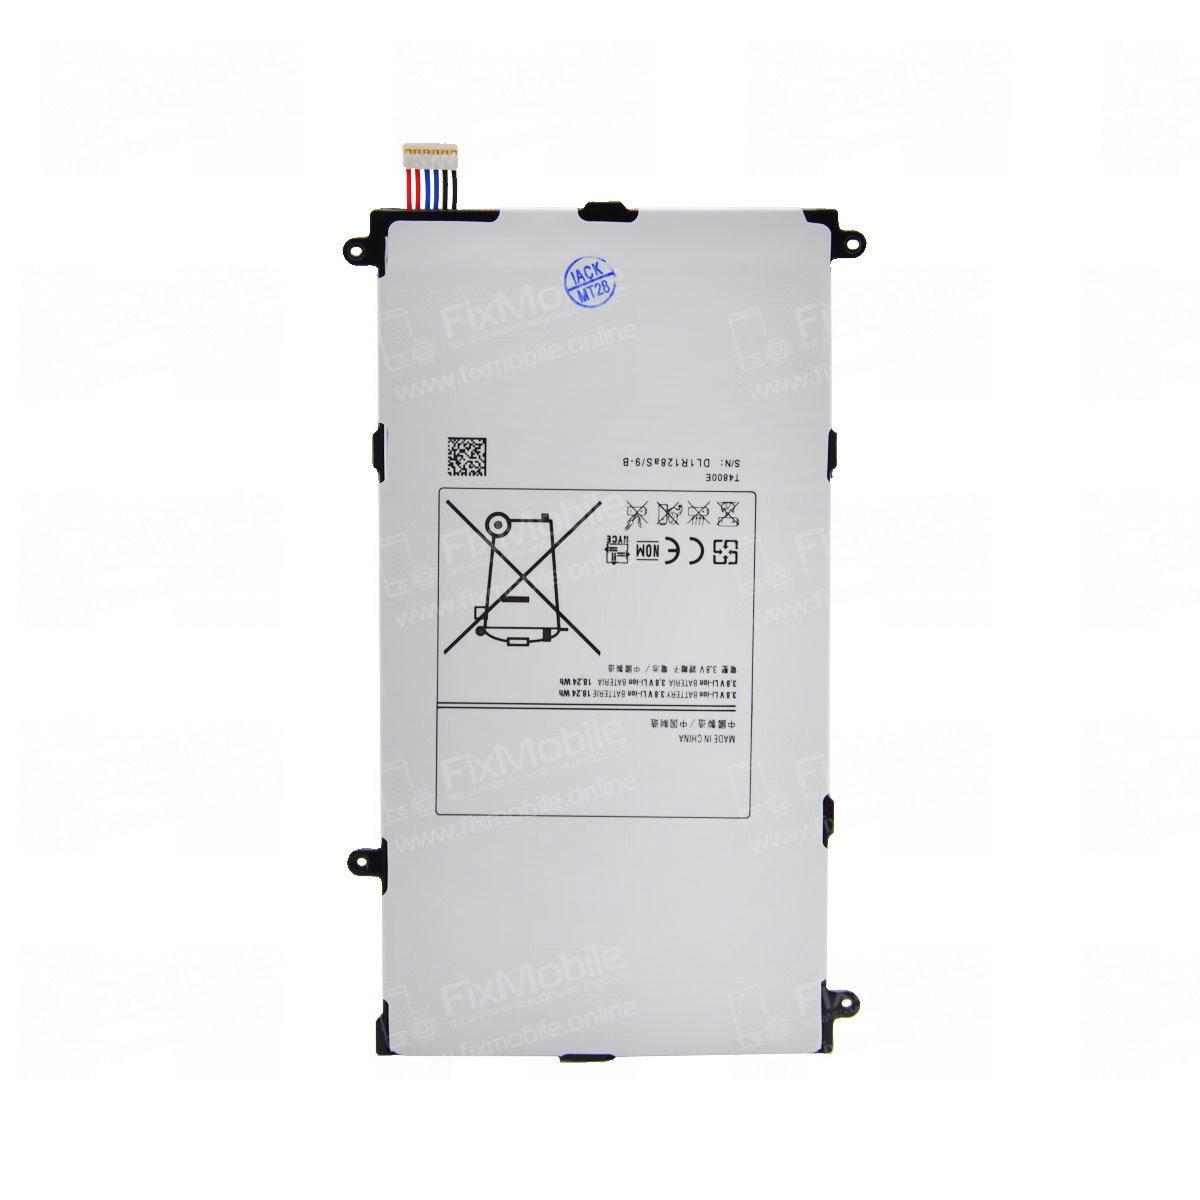 Аккумуляторная батарея для Samsung T320 T4800E